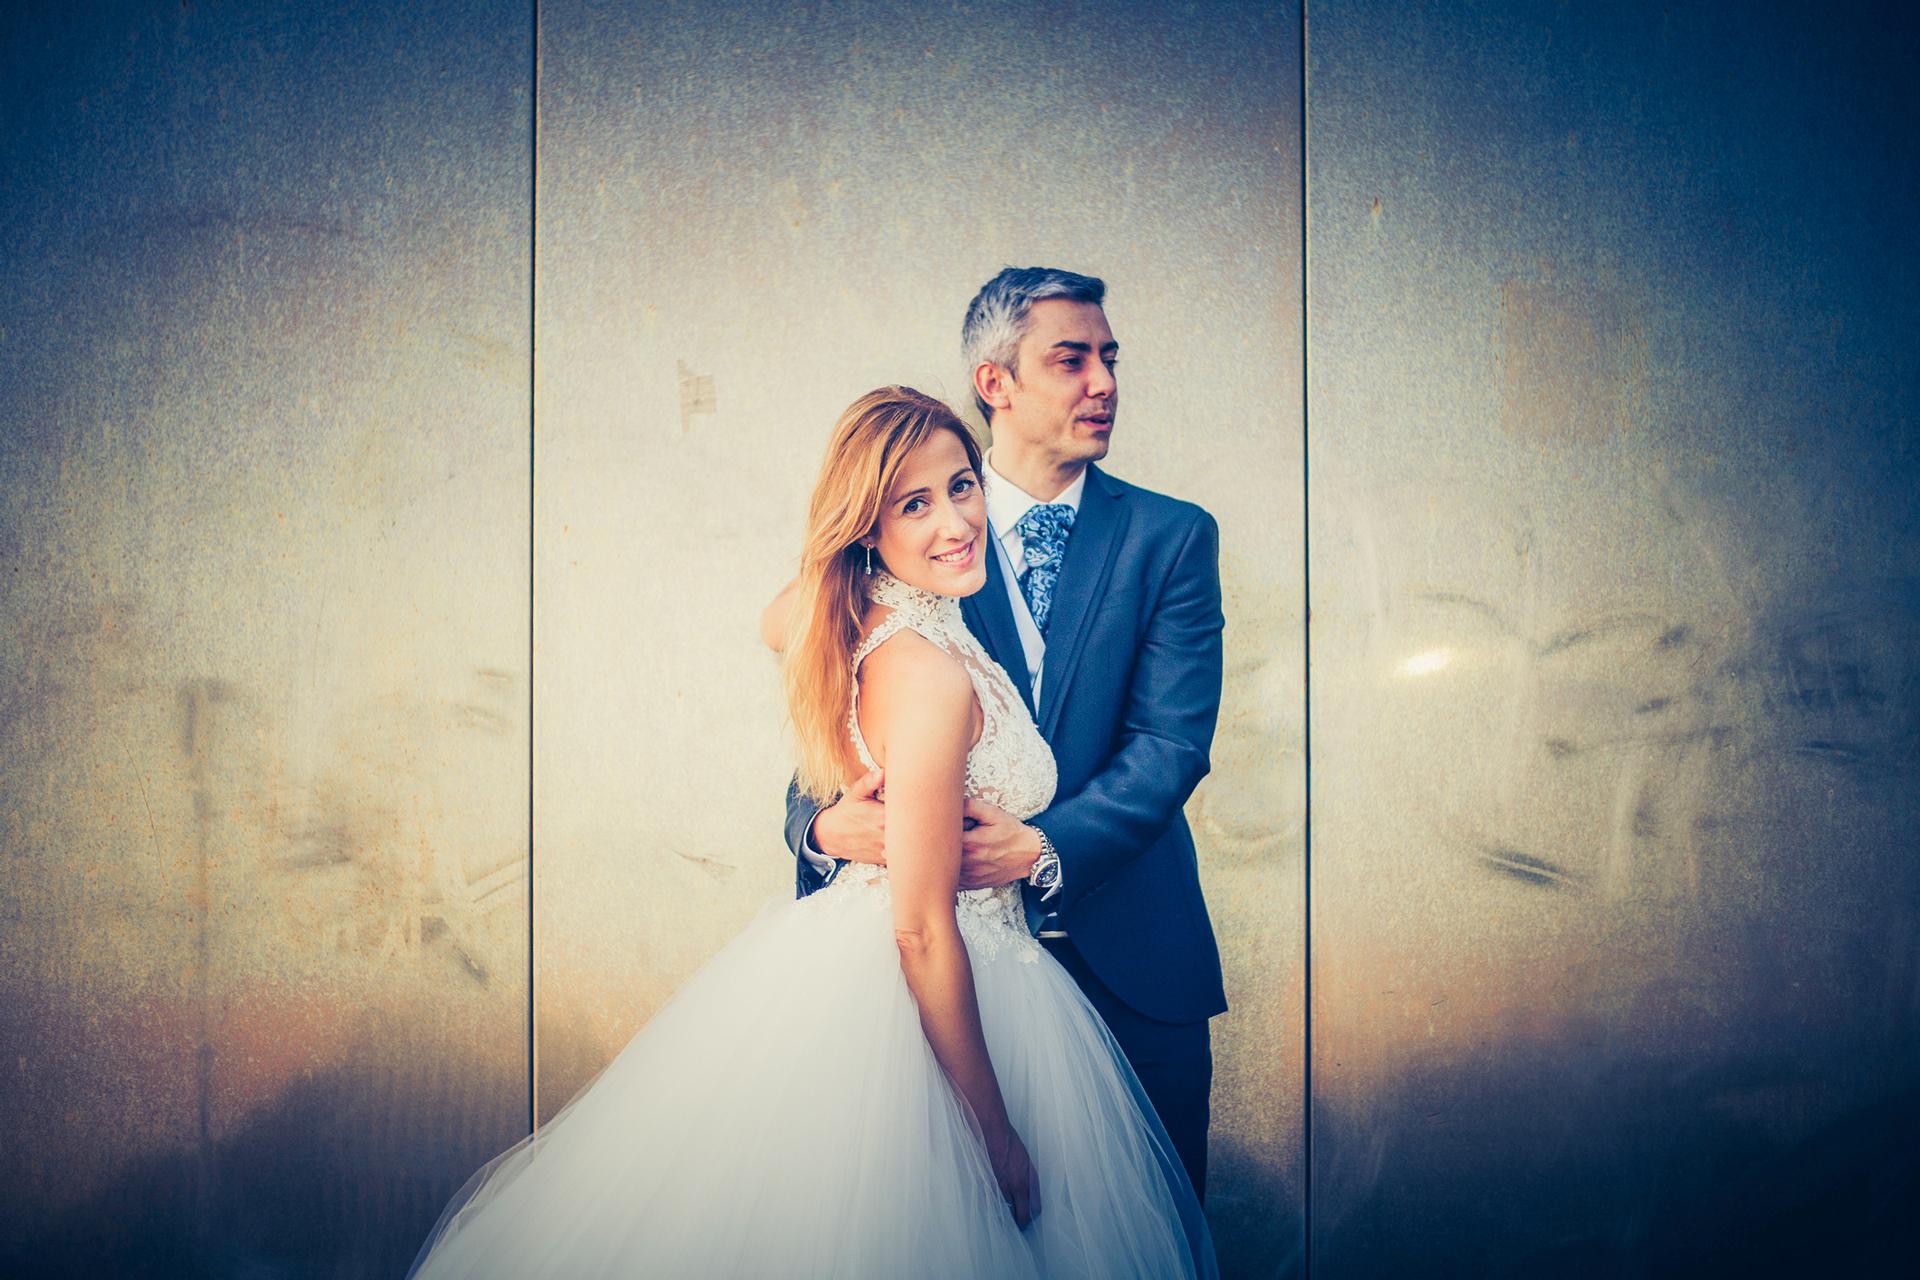 Wedding & Event Planner - Destination Wedding en San Sebastián - Boda Lara y Gelo 07